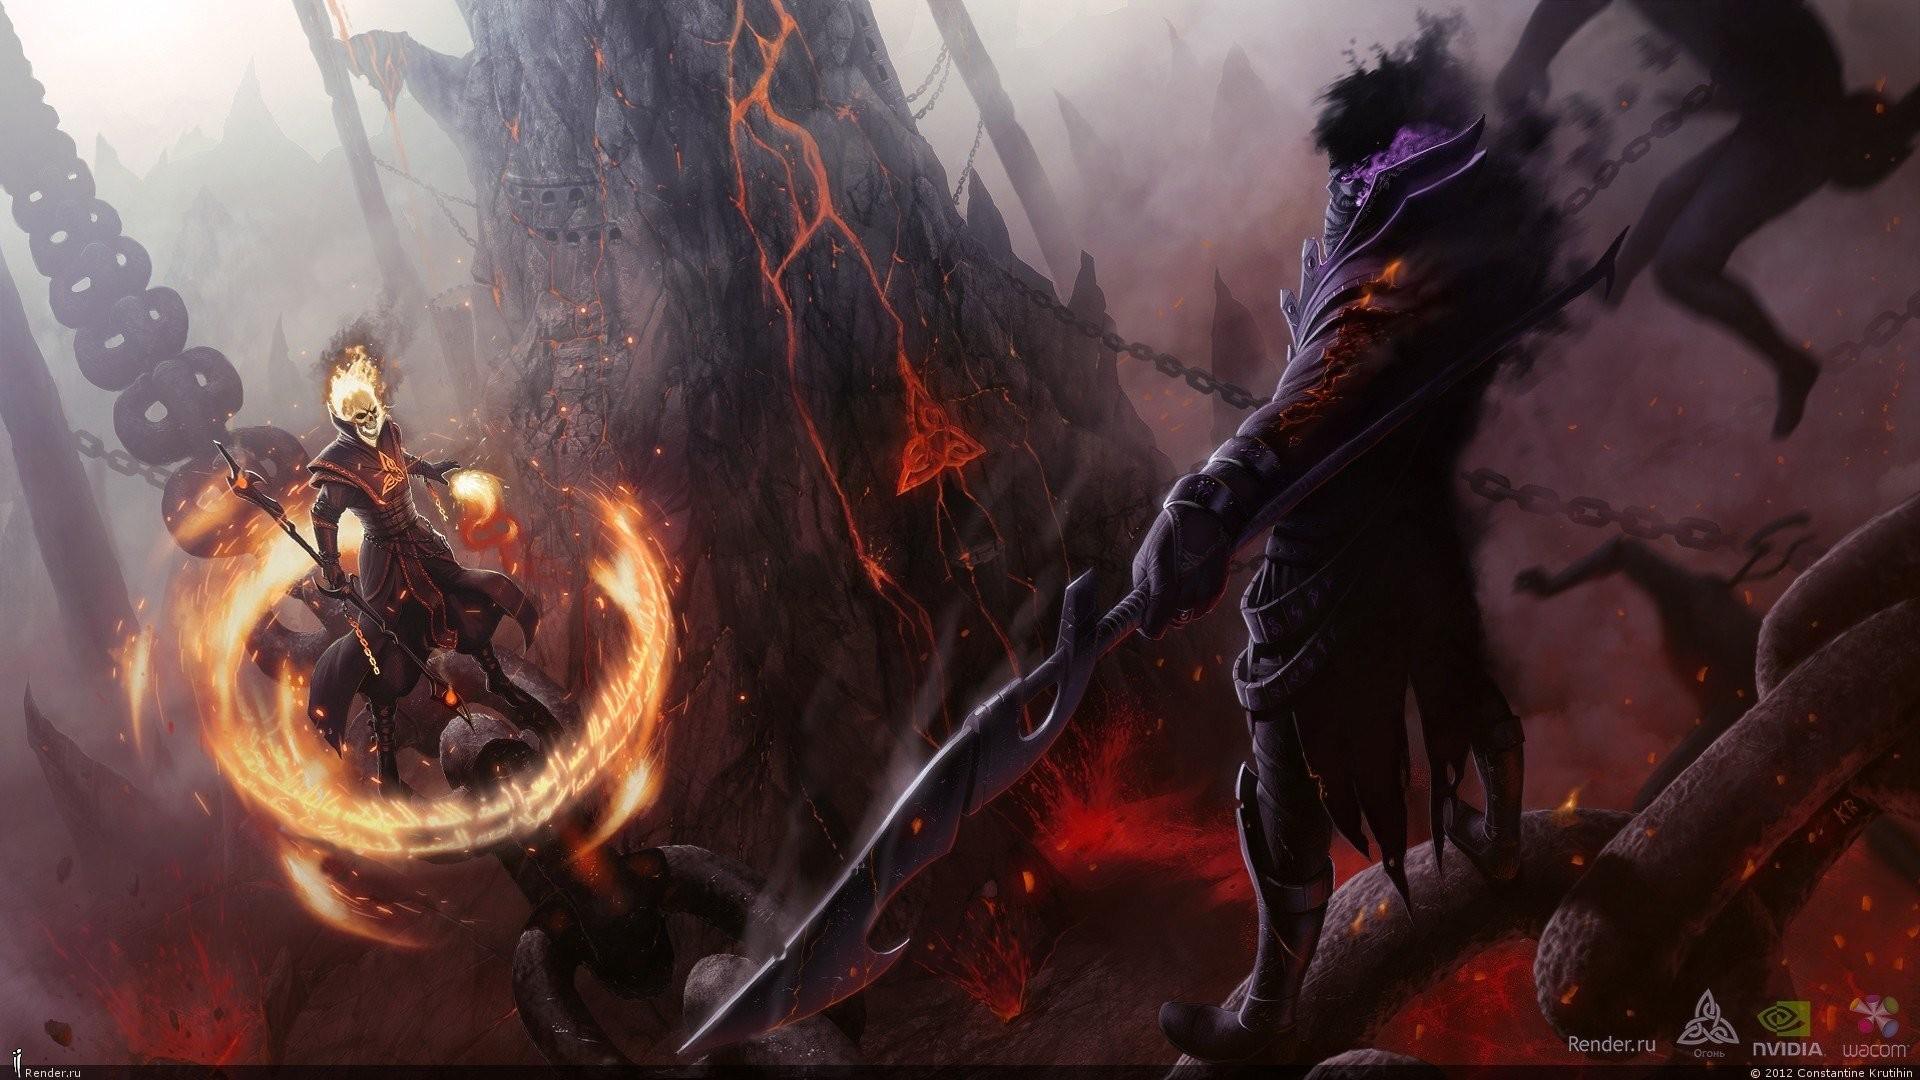 mage tower tower magicians wizard magician sorcerer wizard warlock sorcerer  chain circuit lava lava fire fire